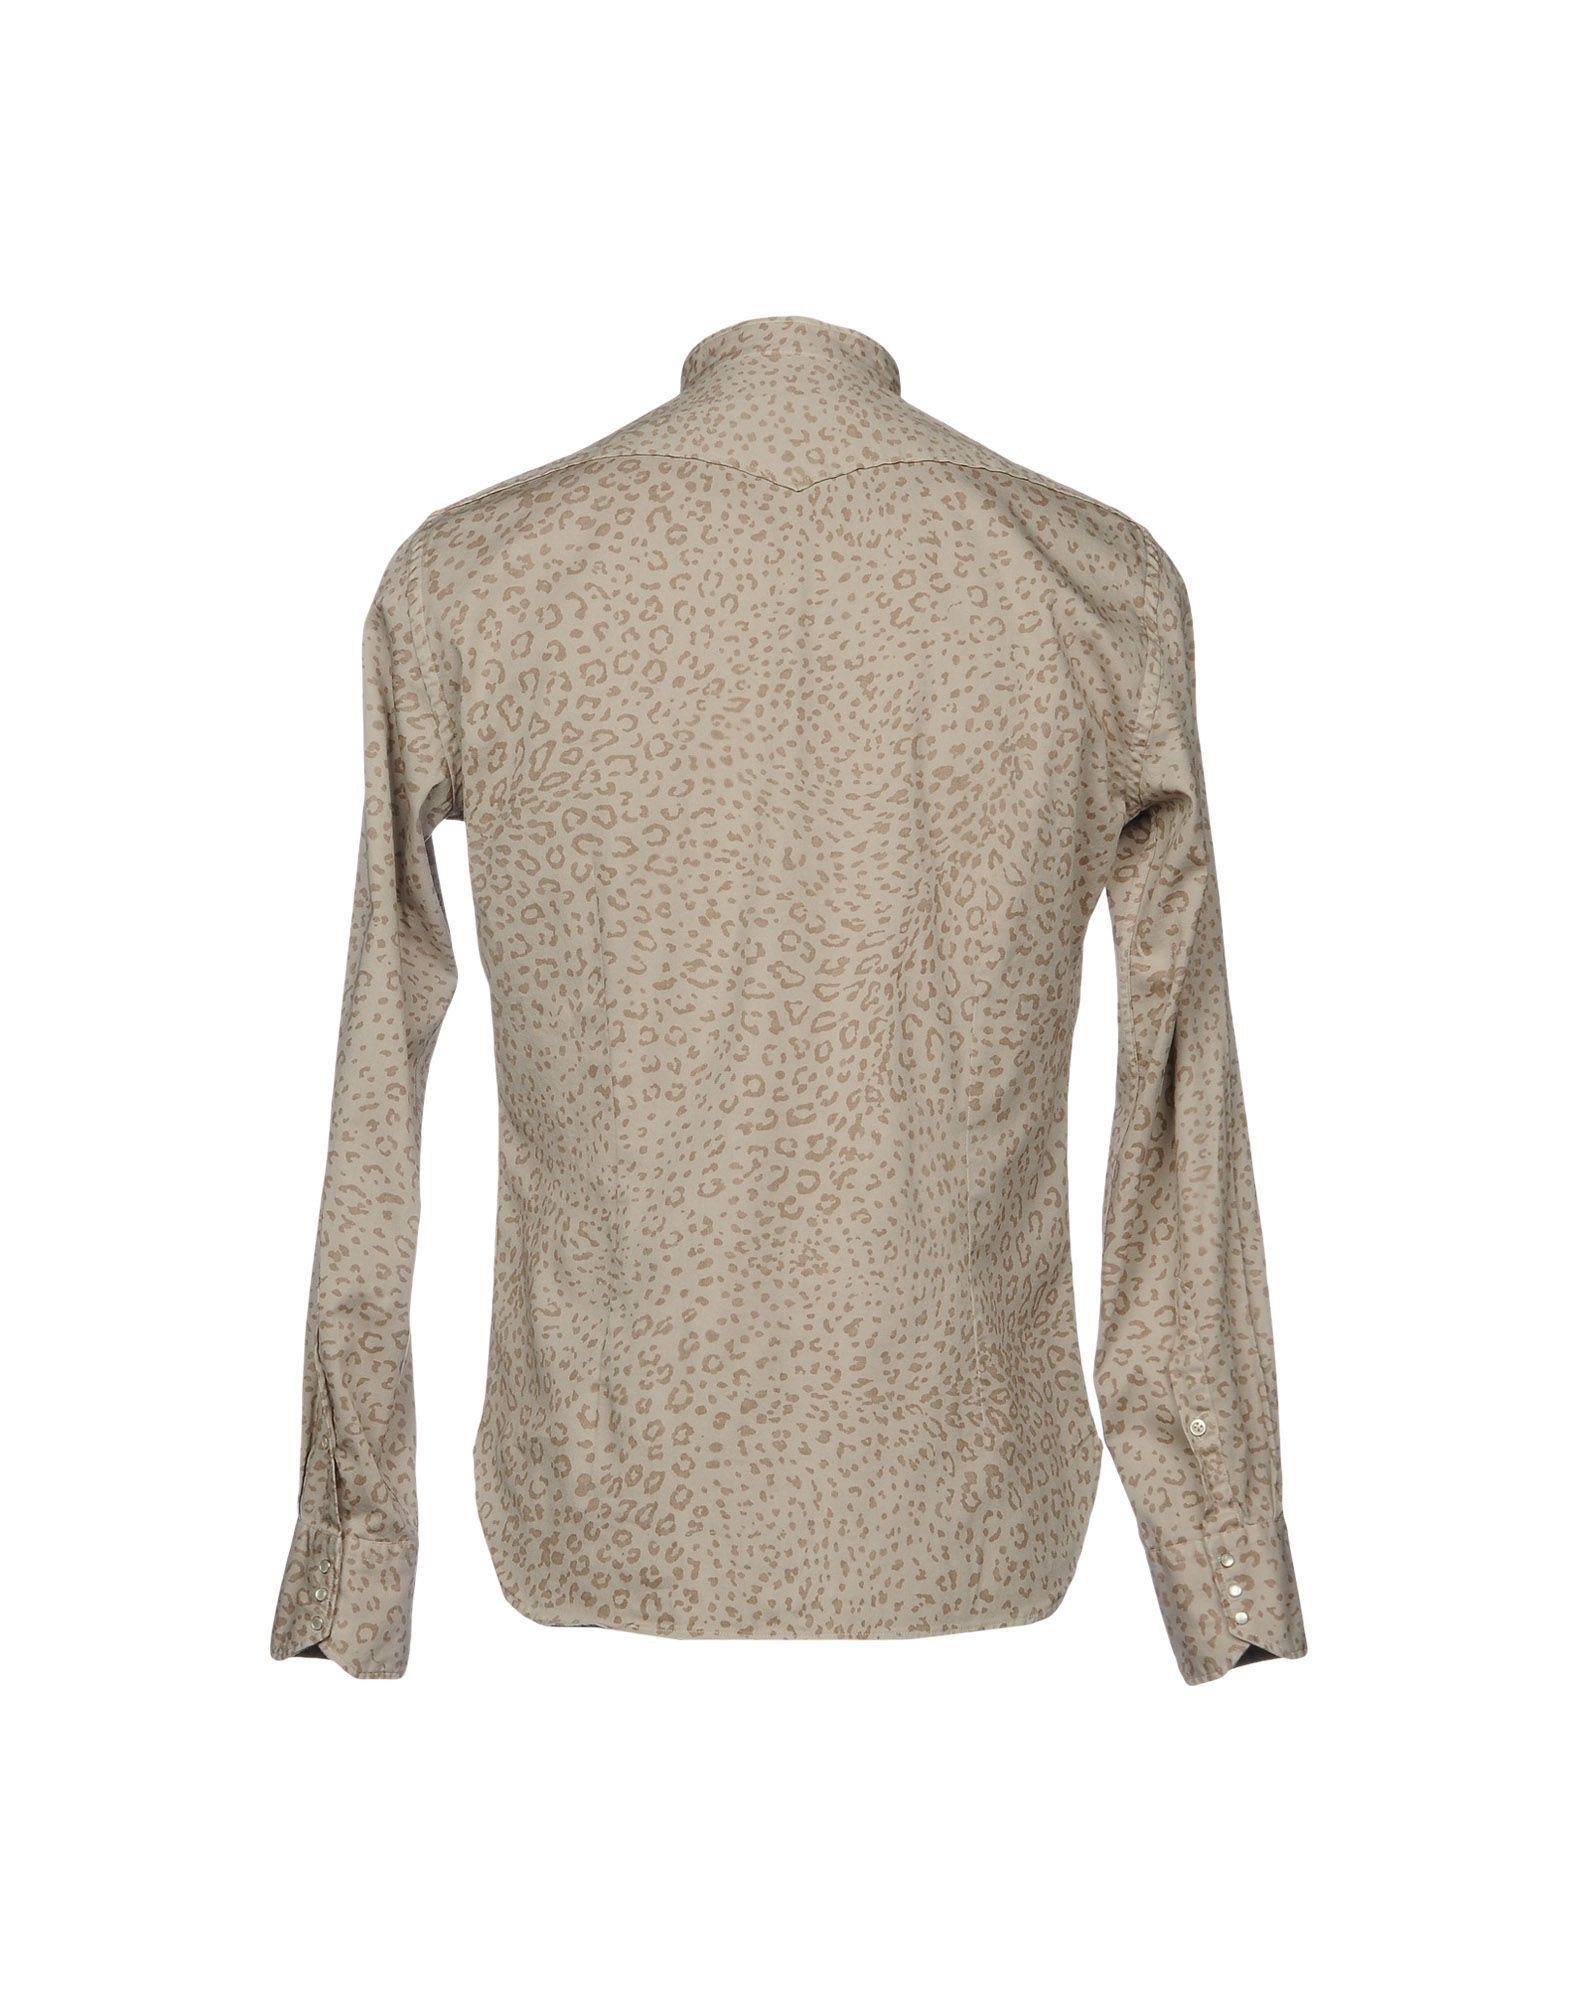 SHIRTS 6167 Sand Man Cotton